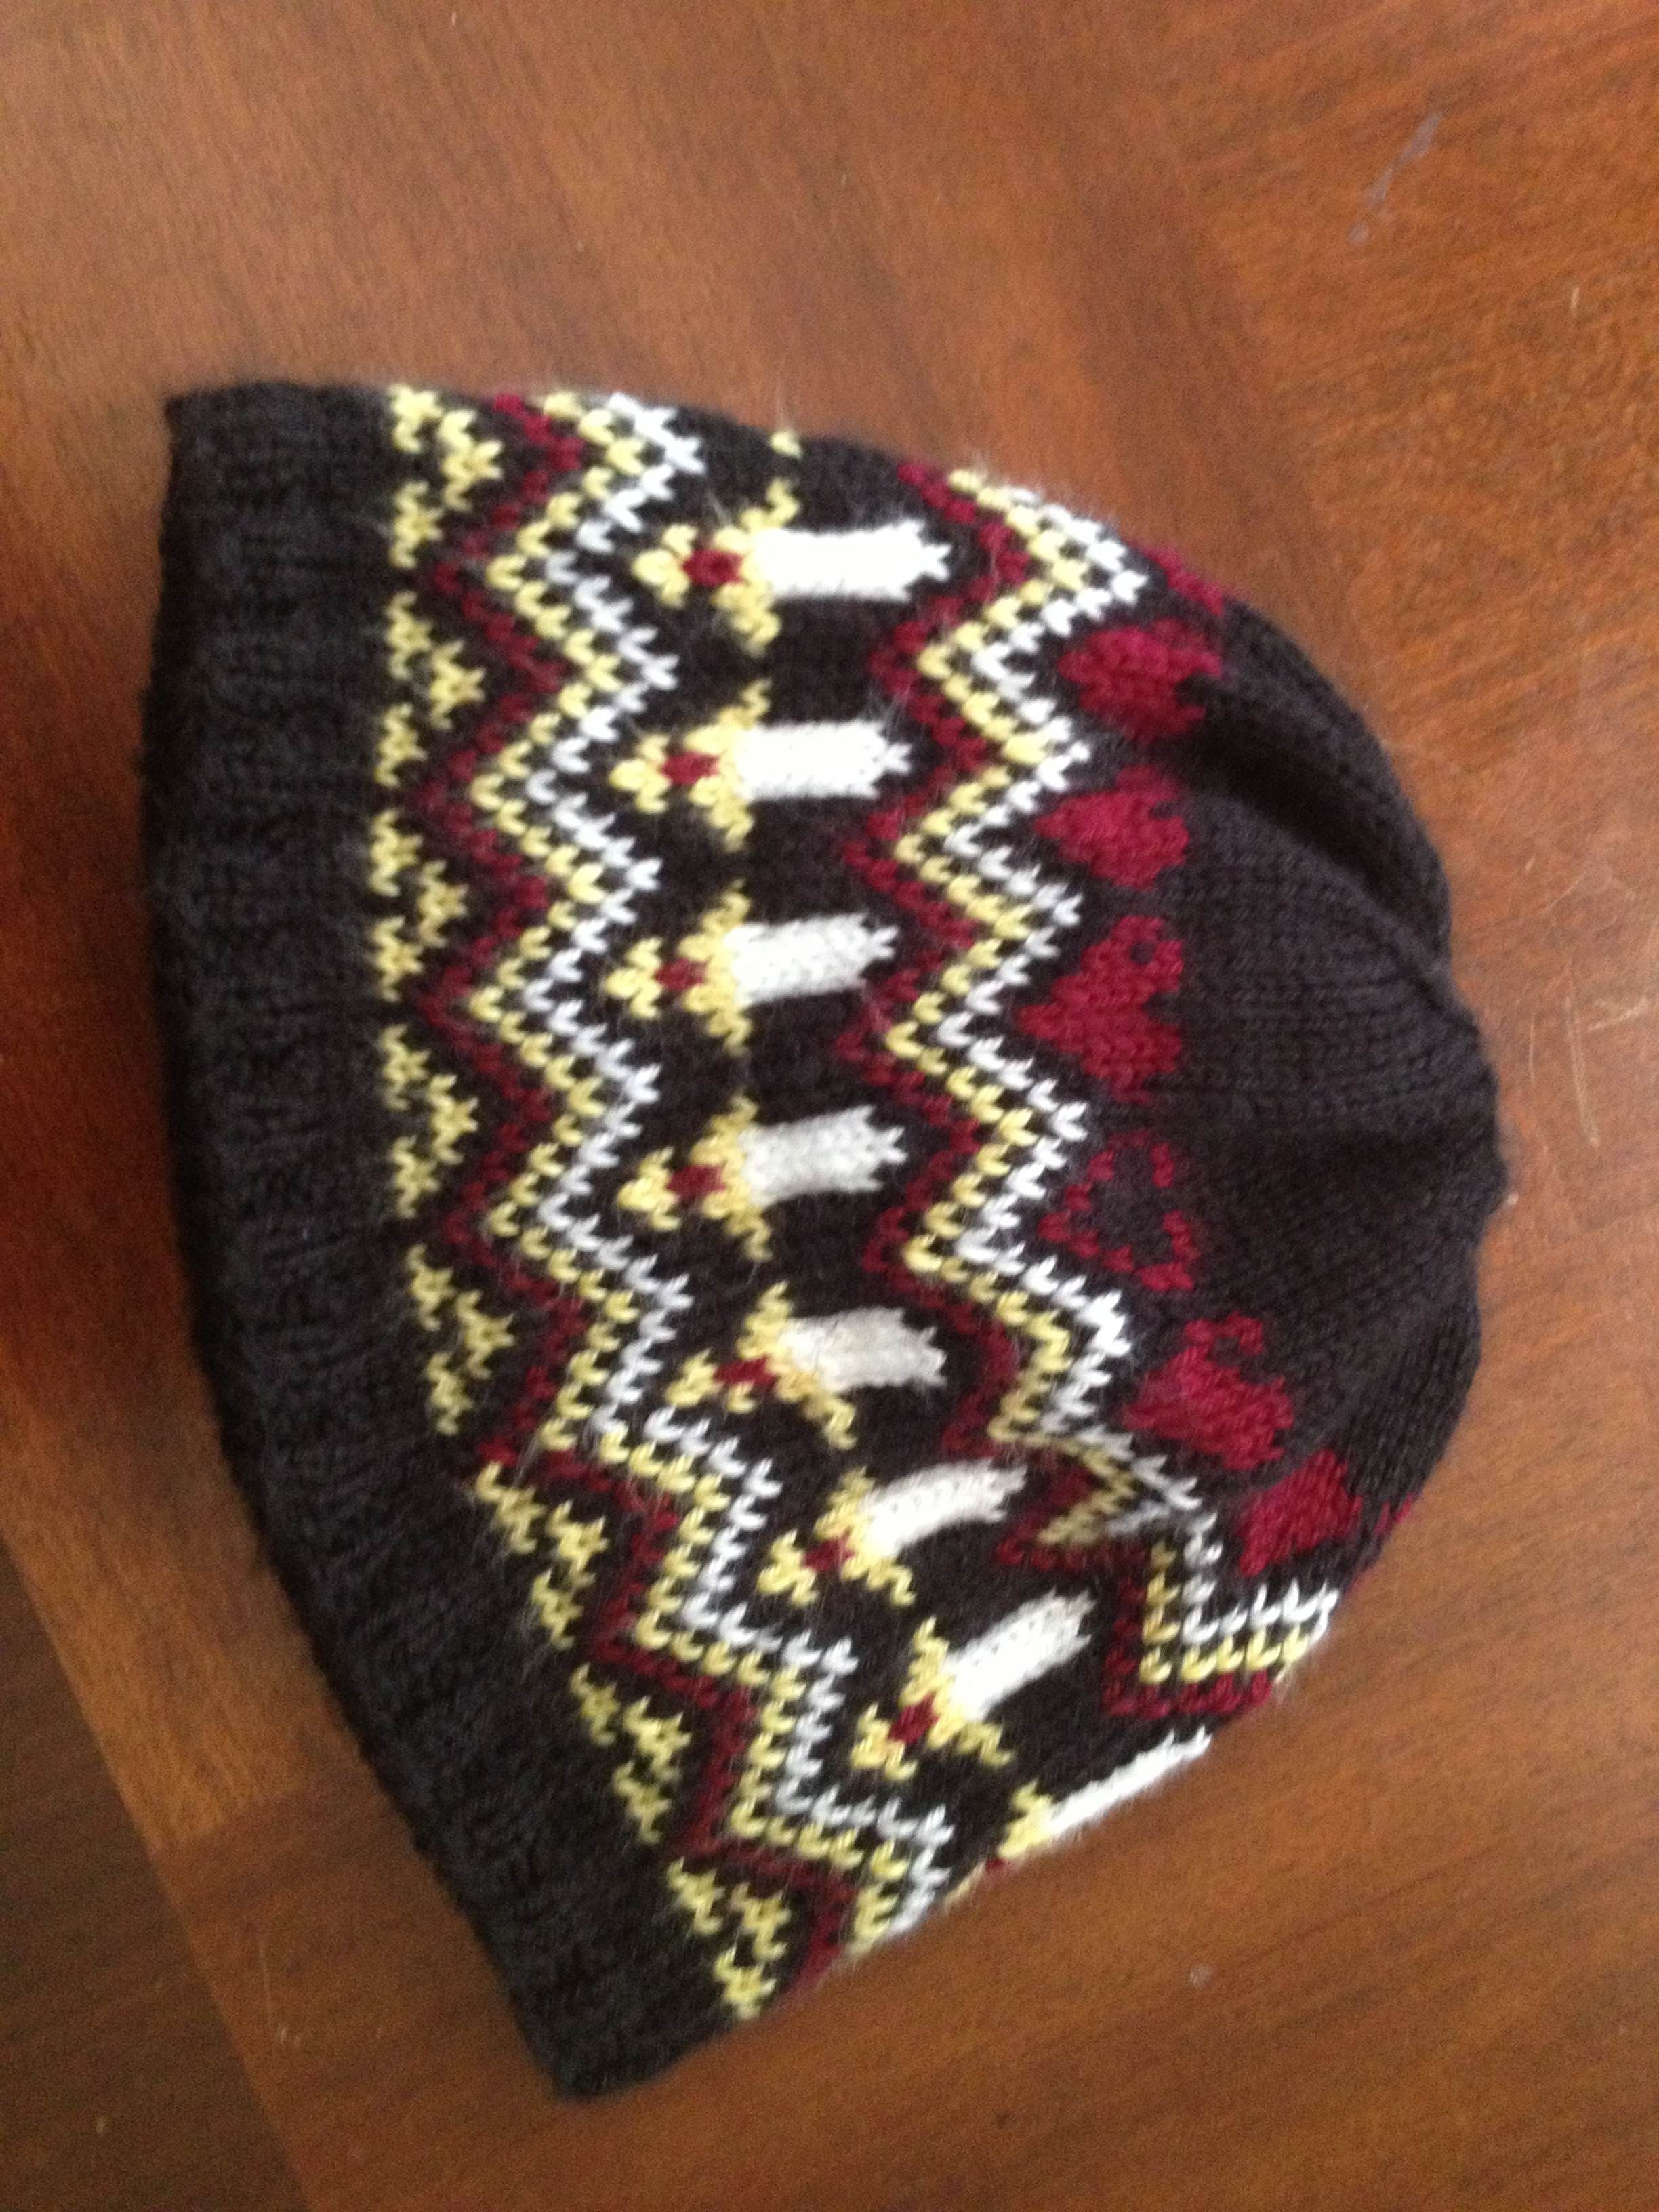 Legend of Zelda knit hat pattern | Hook and needles | Pinterest ...